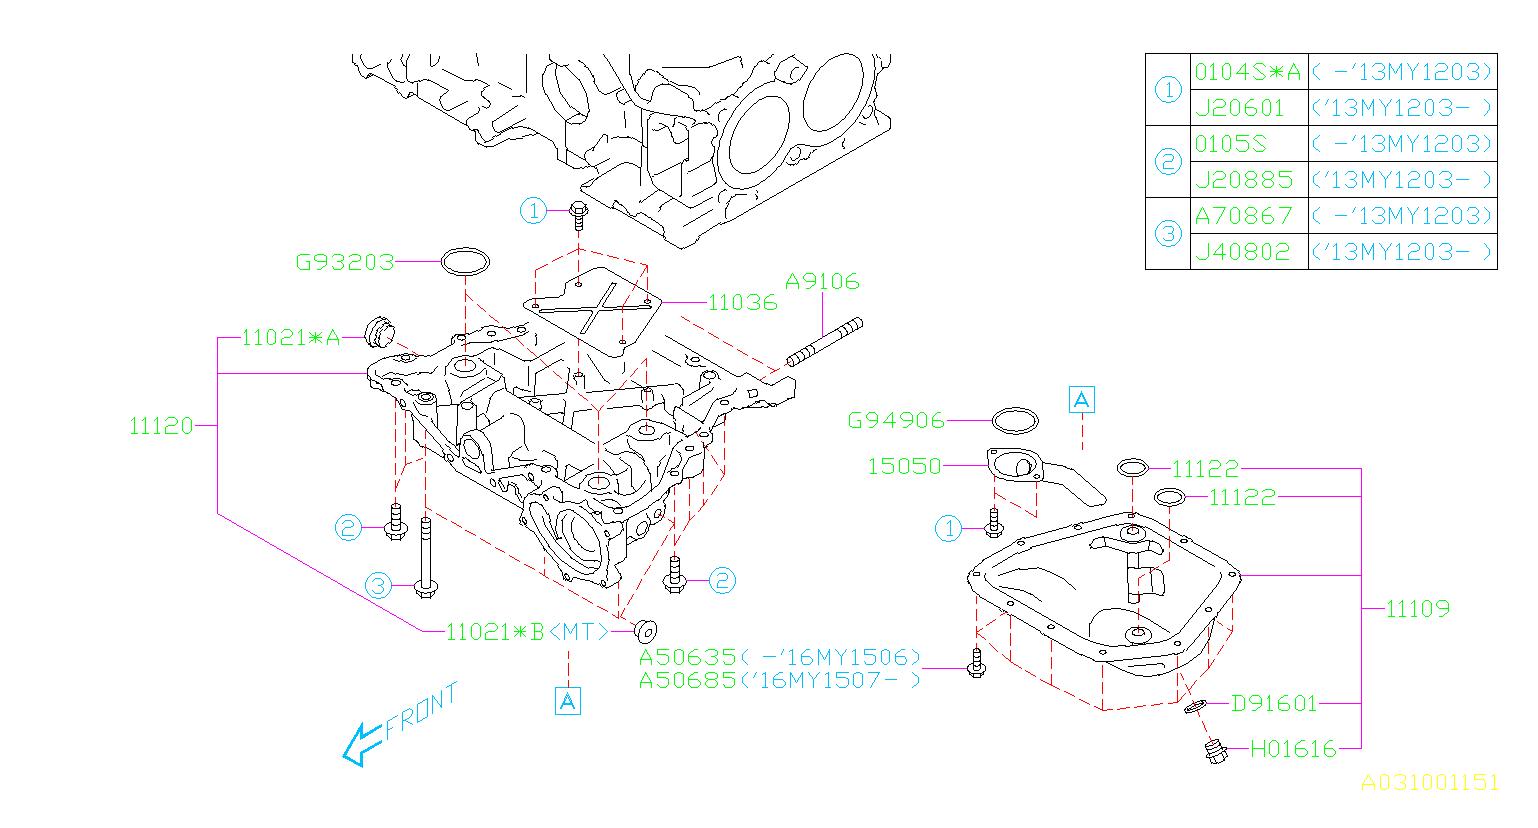 Subaru BRZ Engine Expansion Plug - 11021AA112 | Kirby ...